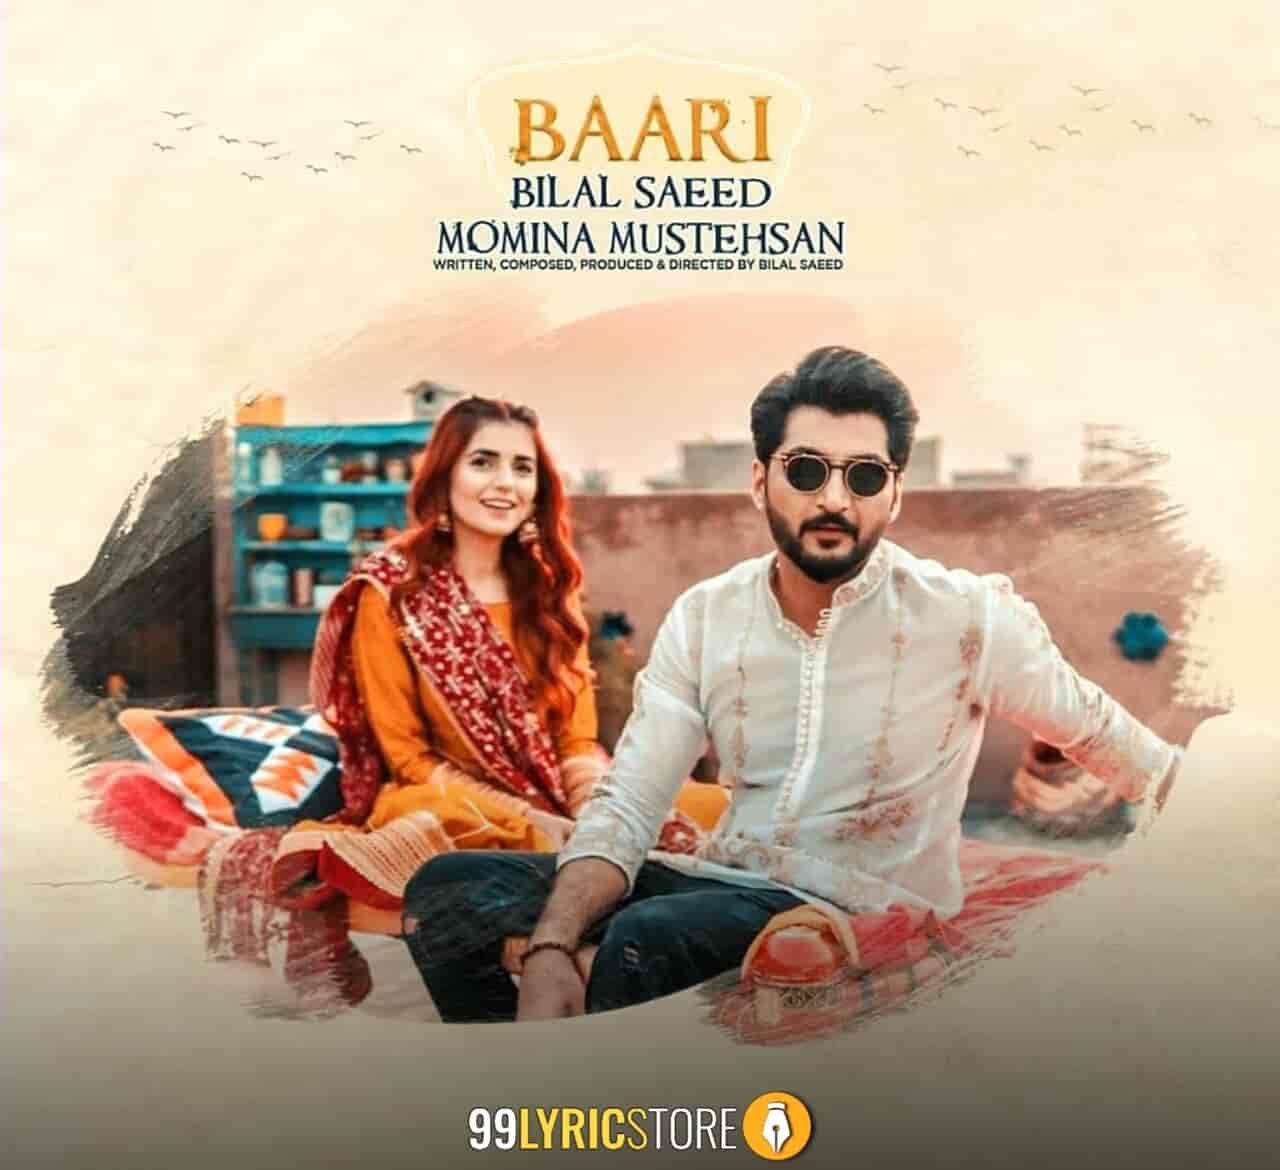 Baari Lyrics Bilal Saeed Momina Mustehsan Lyrics Beautiful Songs Songs